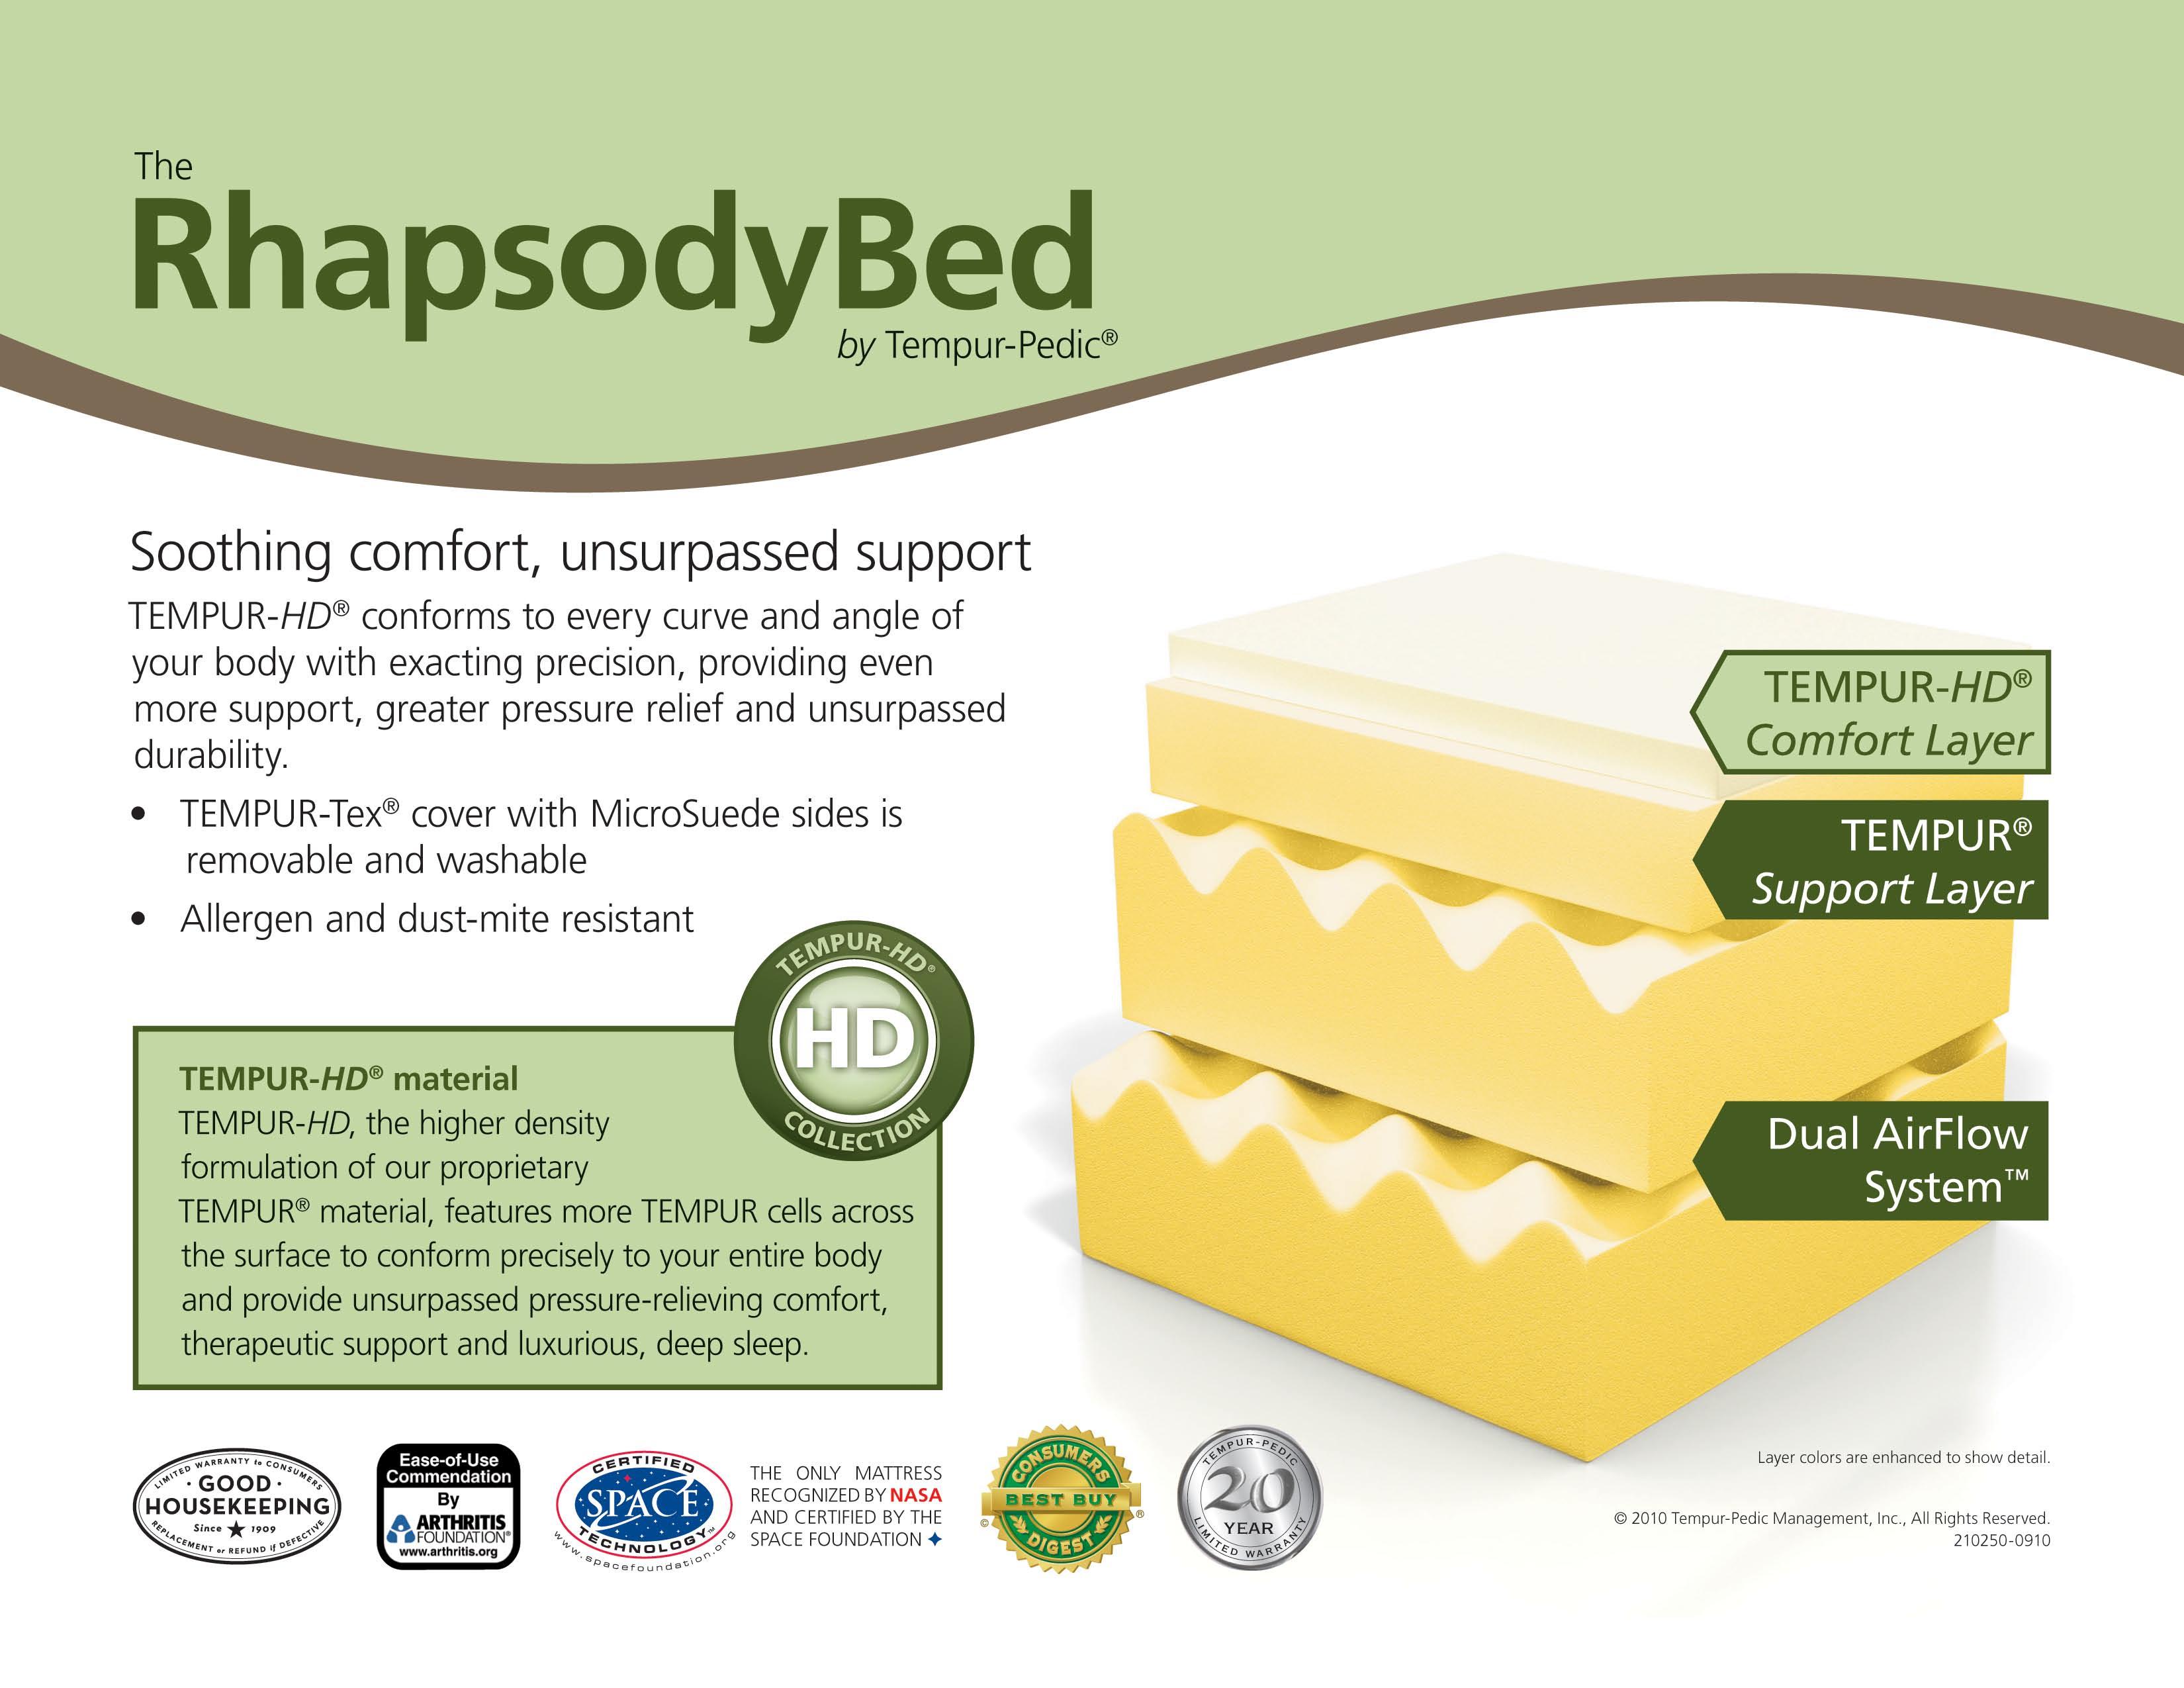 super popular c8994 93bf0 The RhapsodyBed by Tempur-Pedic® Mattresses